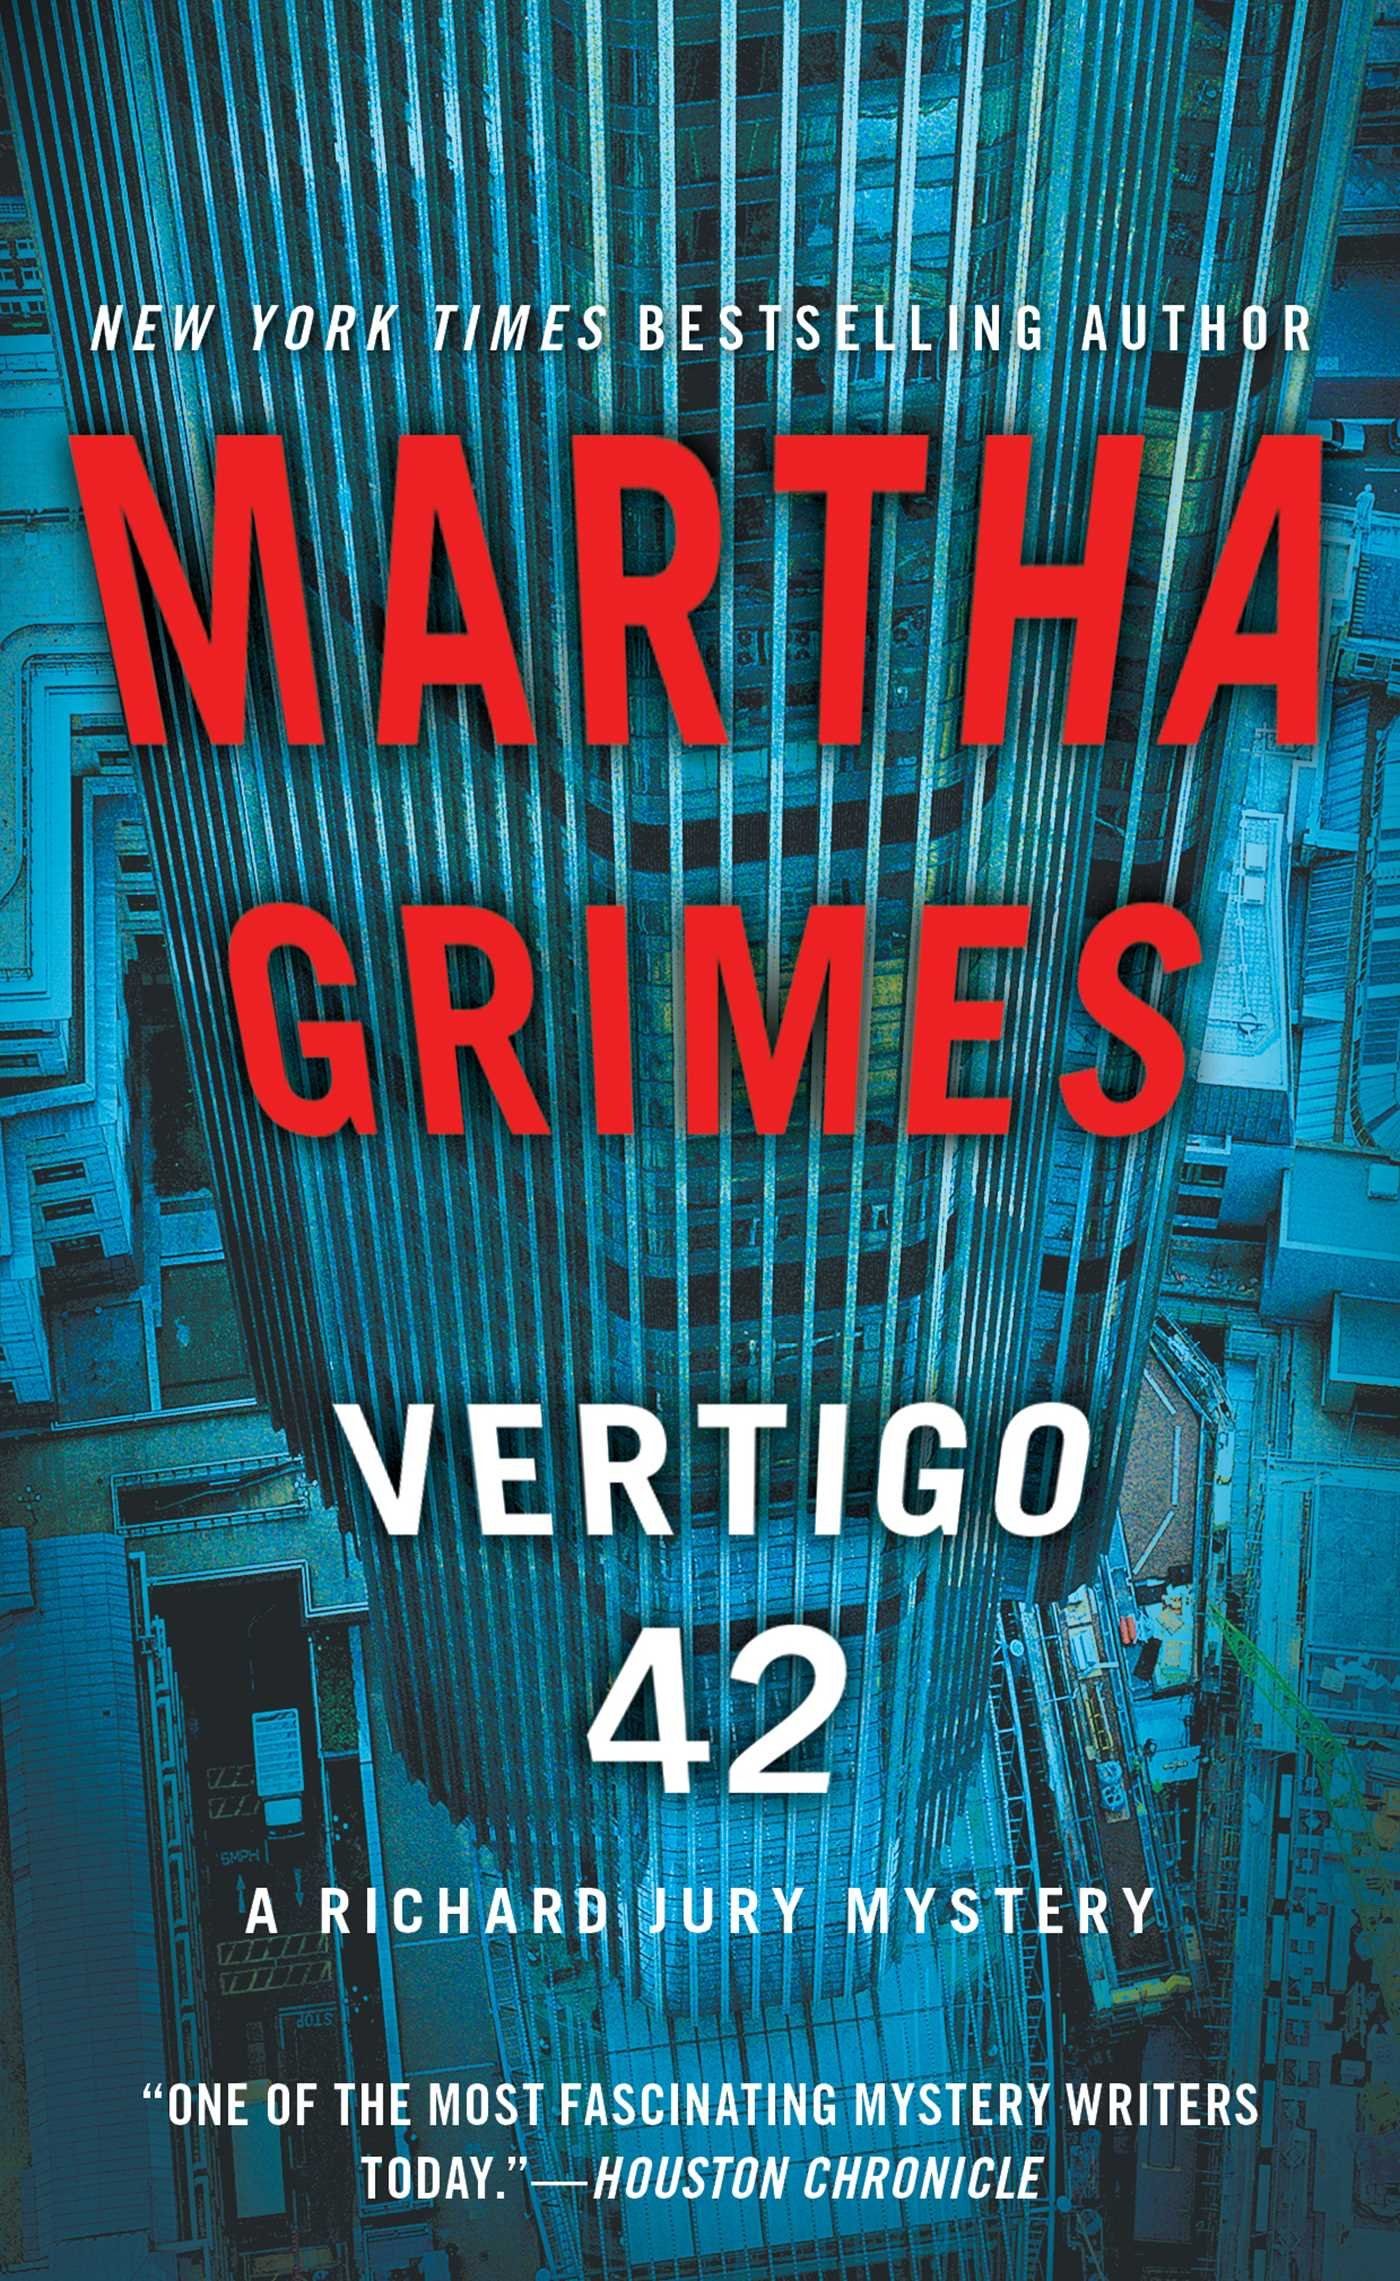 Vertigo 42: A Richard Jury Mystery: Martha Grimes: 9781476724058 ...